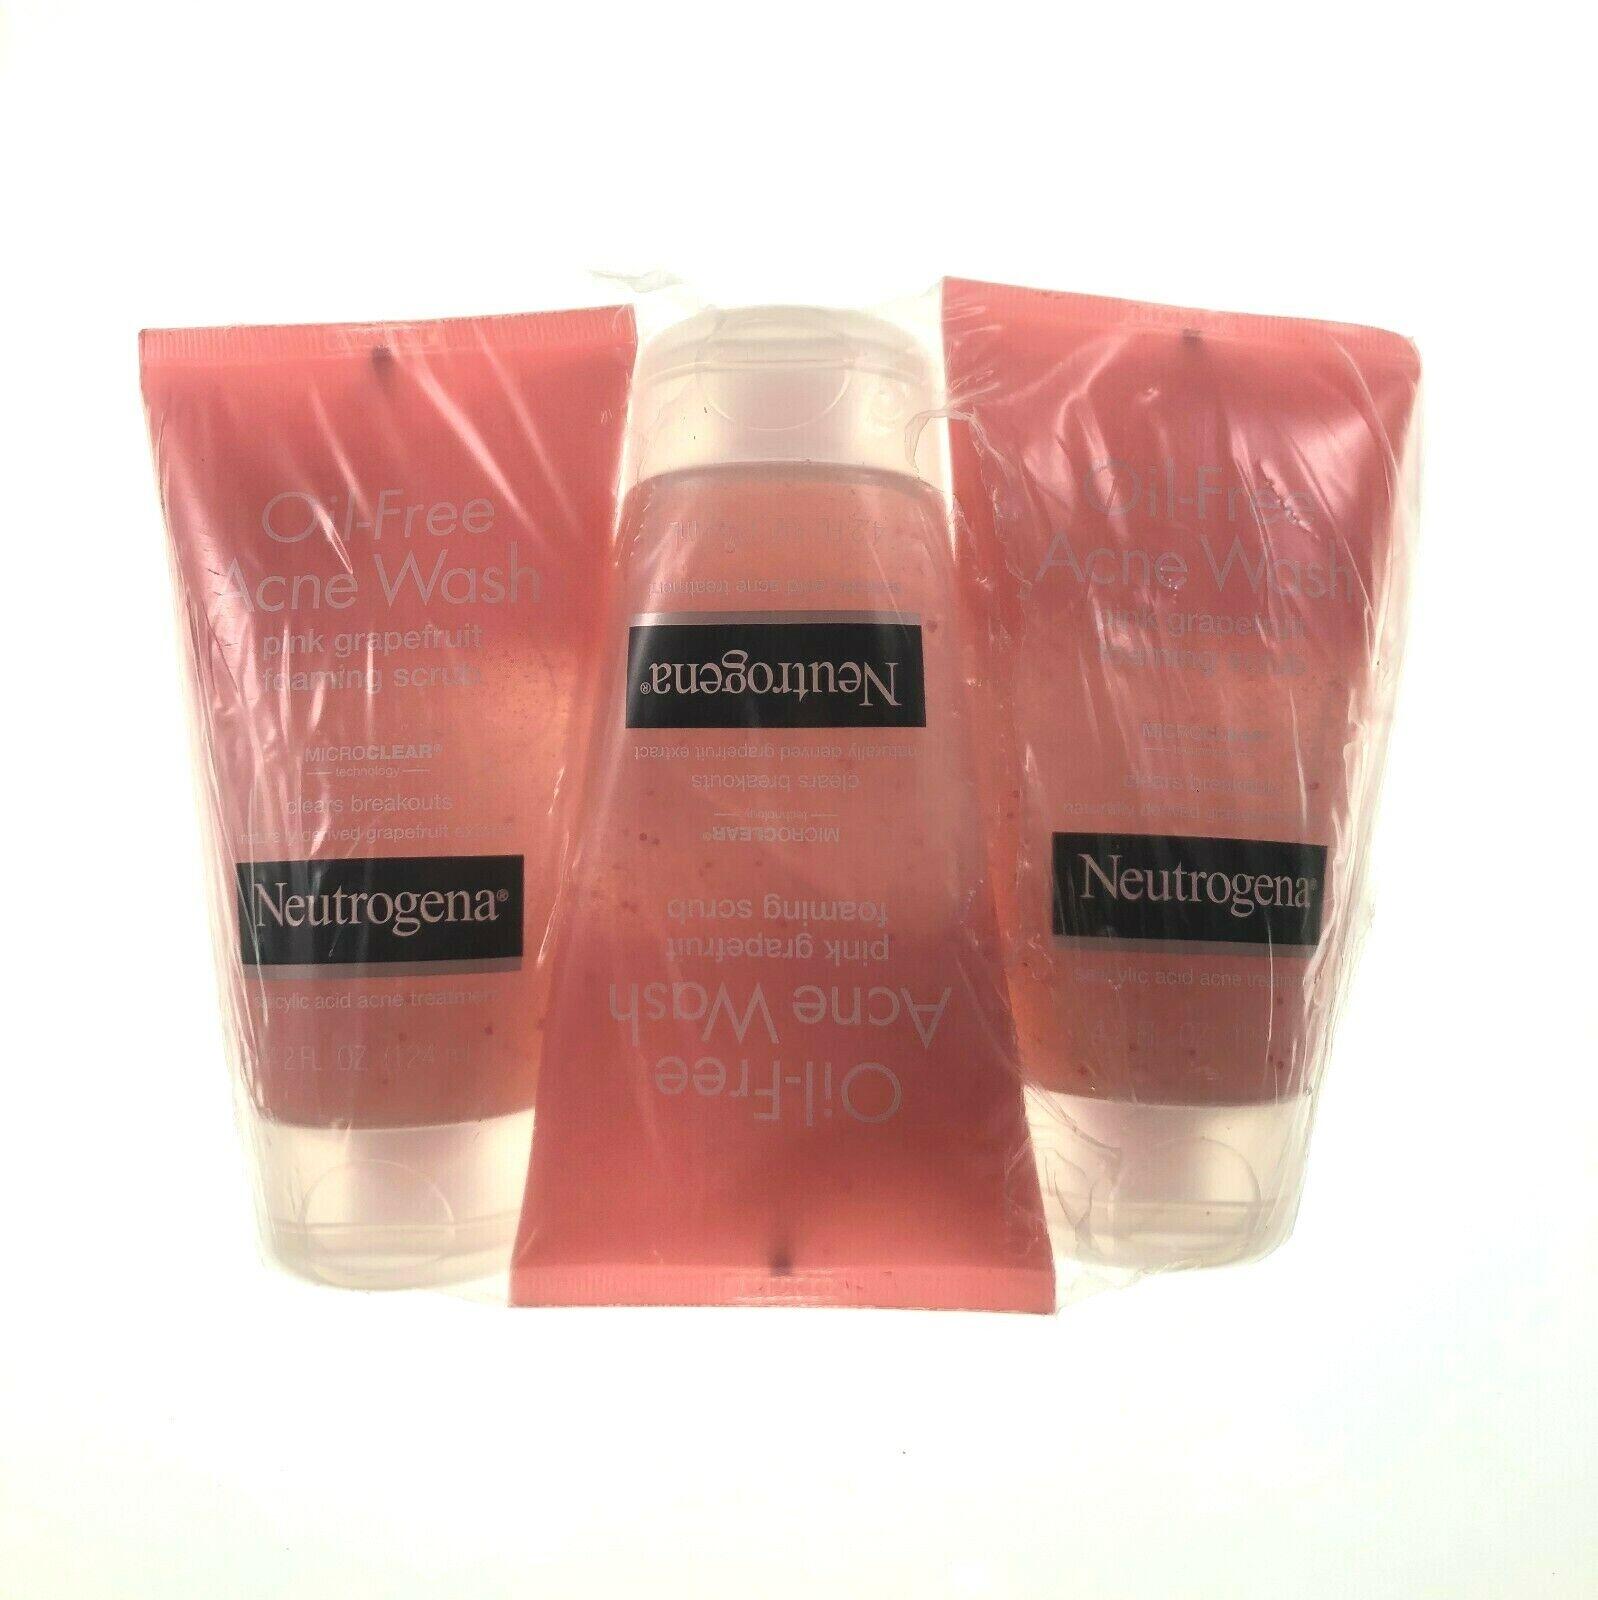 Oil Free Acne Wash Pink Grapefruit Foaming Scrub By Neutroge